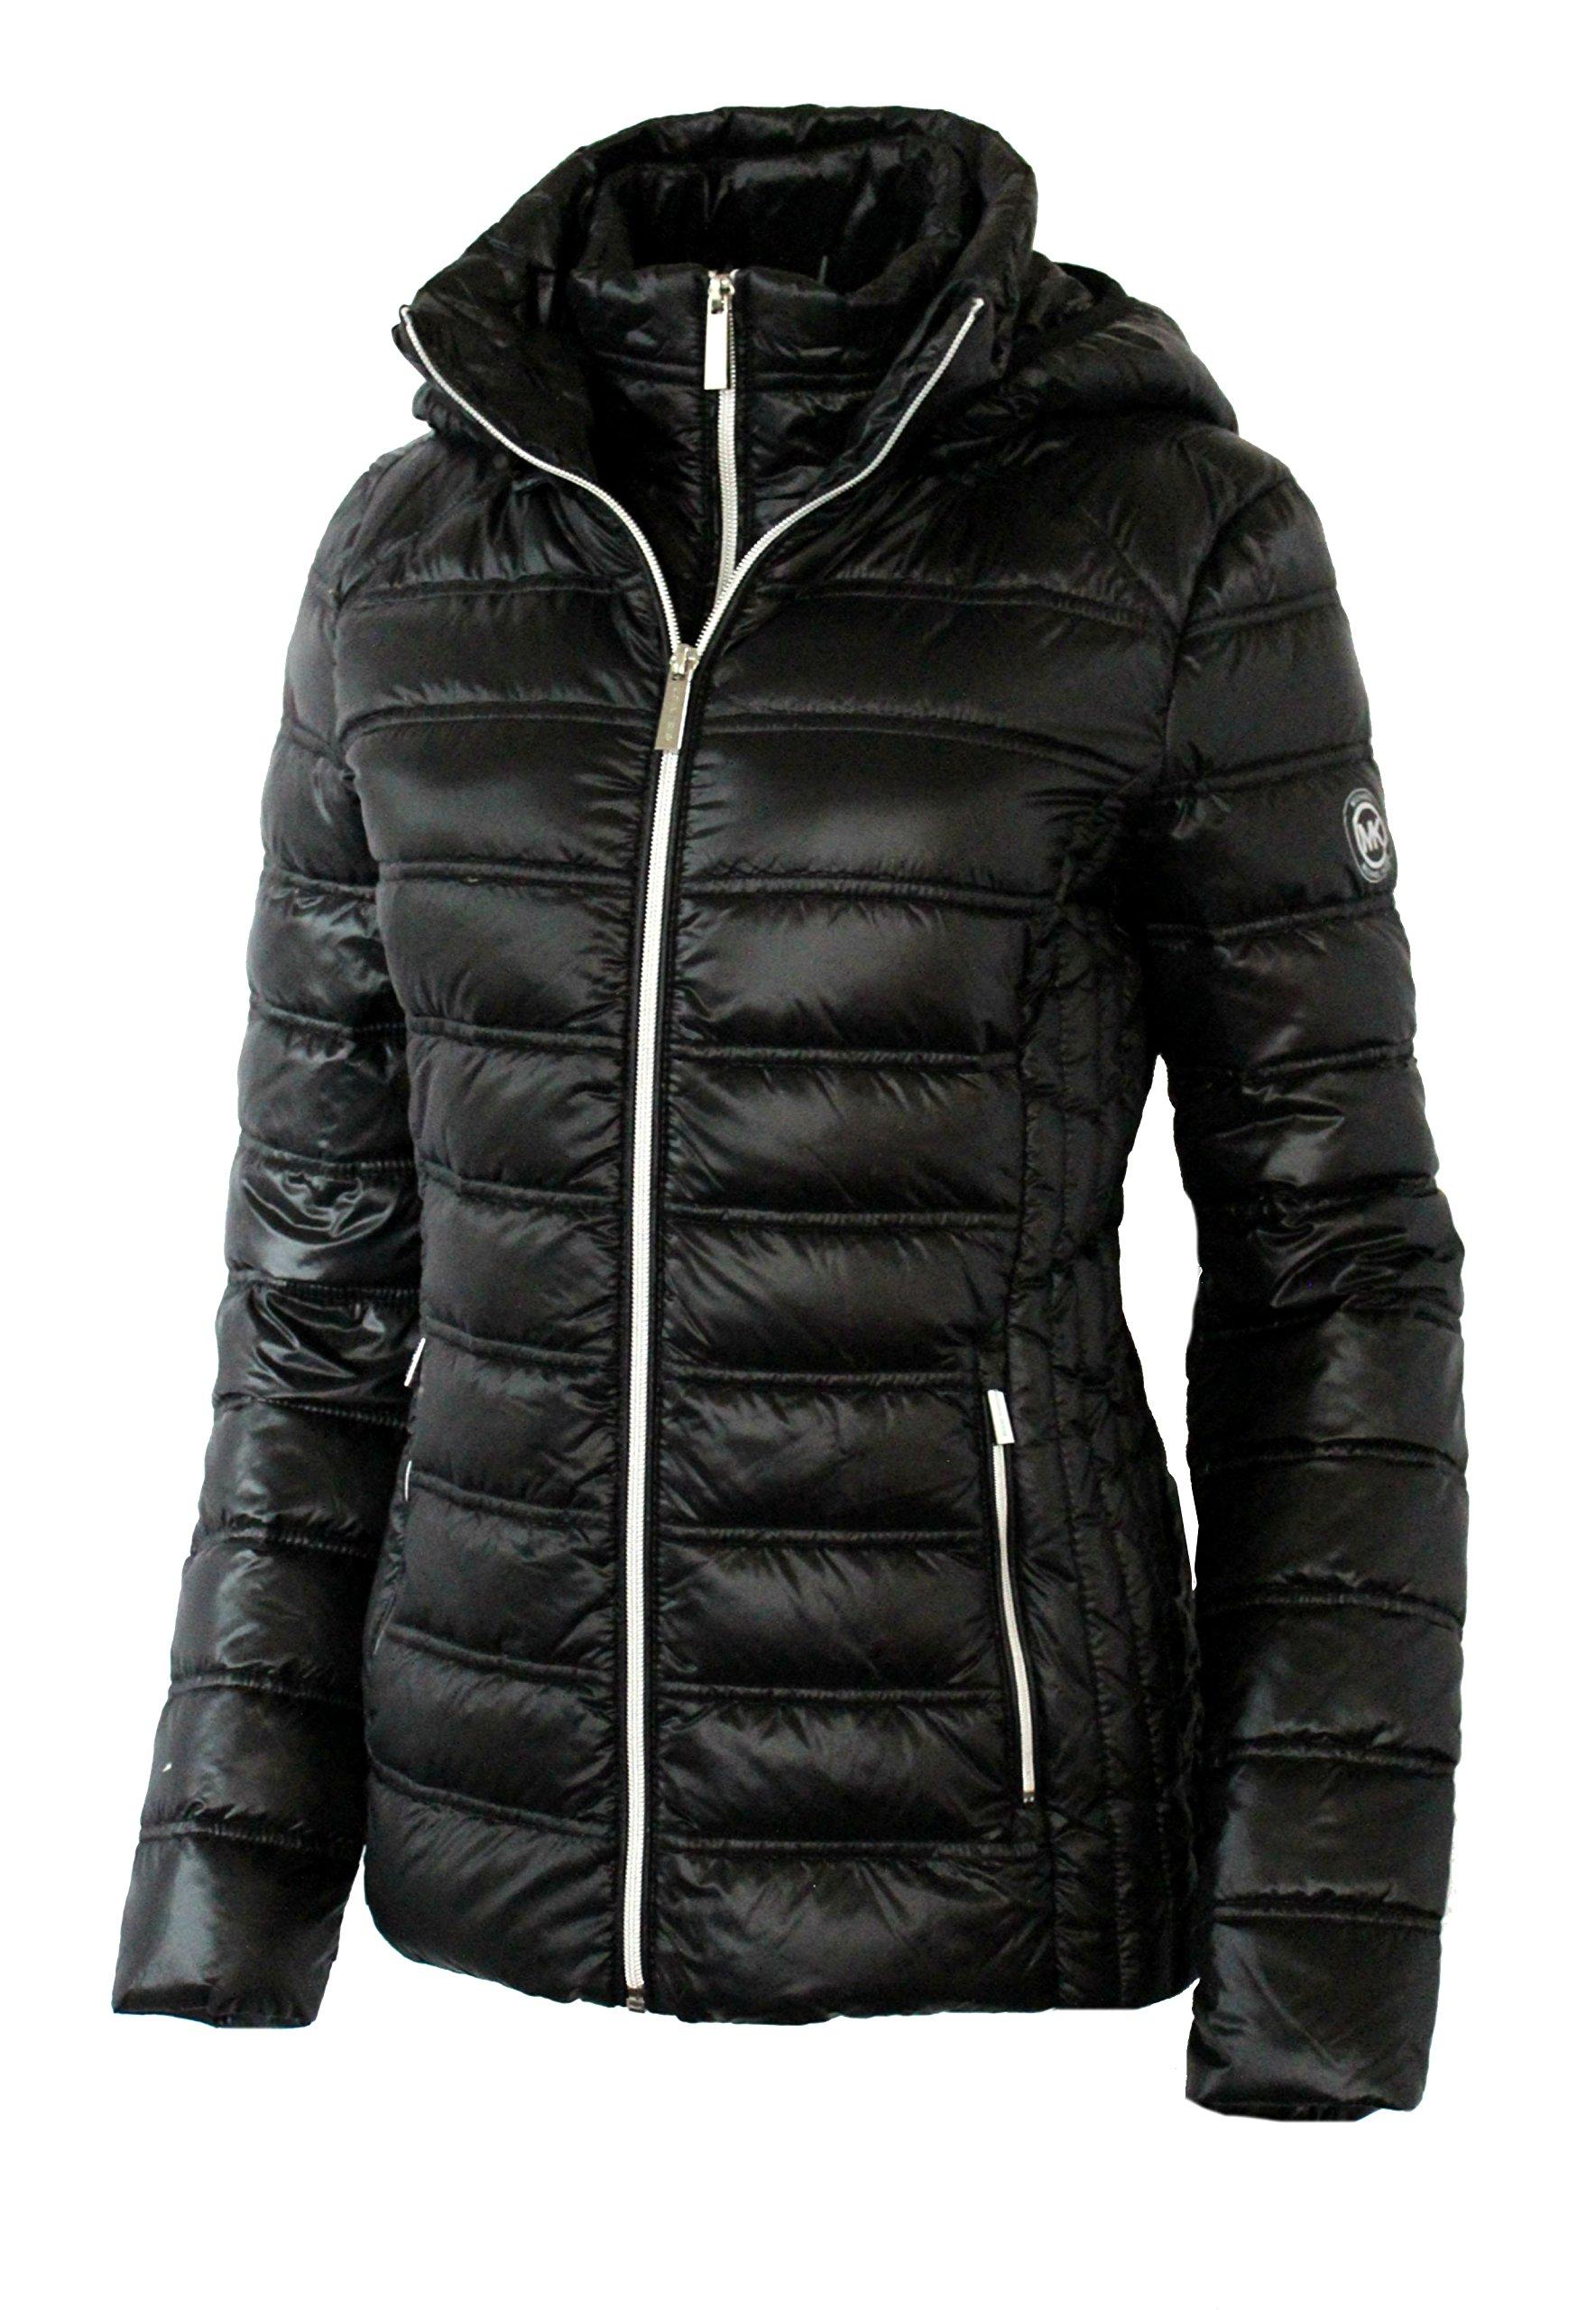 MICHAEL Michael Kors Women's Down Short Packable Puffer Jacket - Black (Small) by MICHAEL Michael Kors